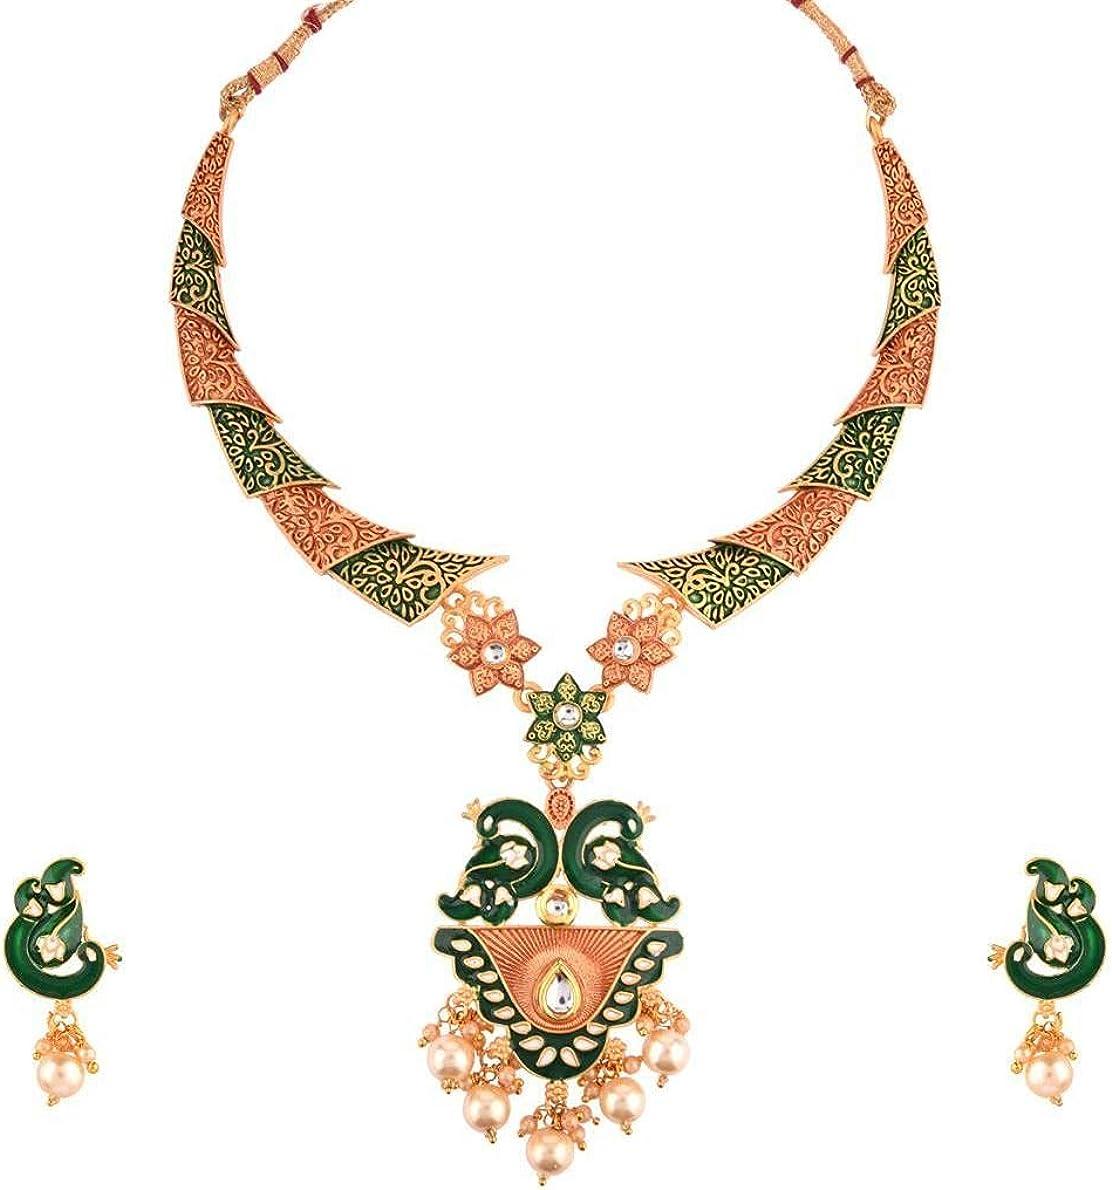 Efulgenz Indian Jewelry Antique Enamel Kundan Crystal Choker Necklace Drop Earrings Bollywood Wedding Jewelry Set